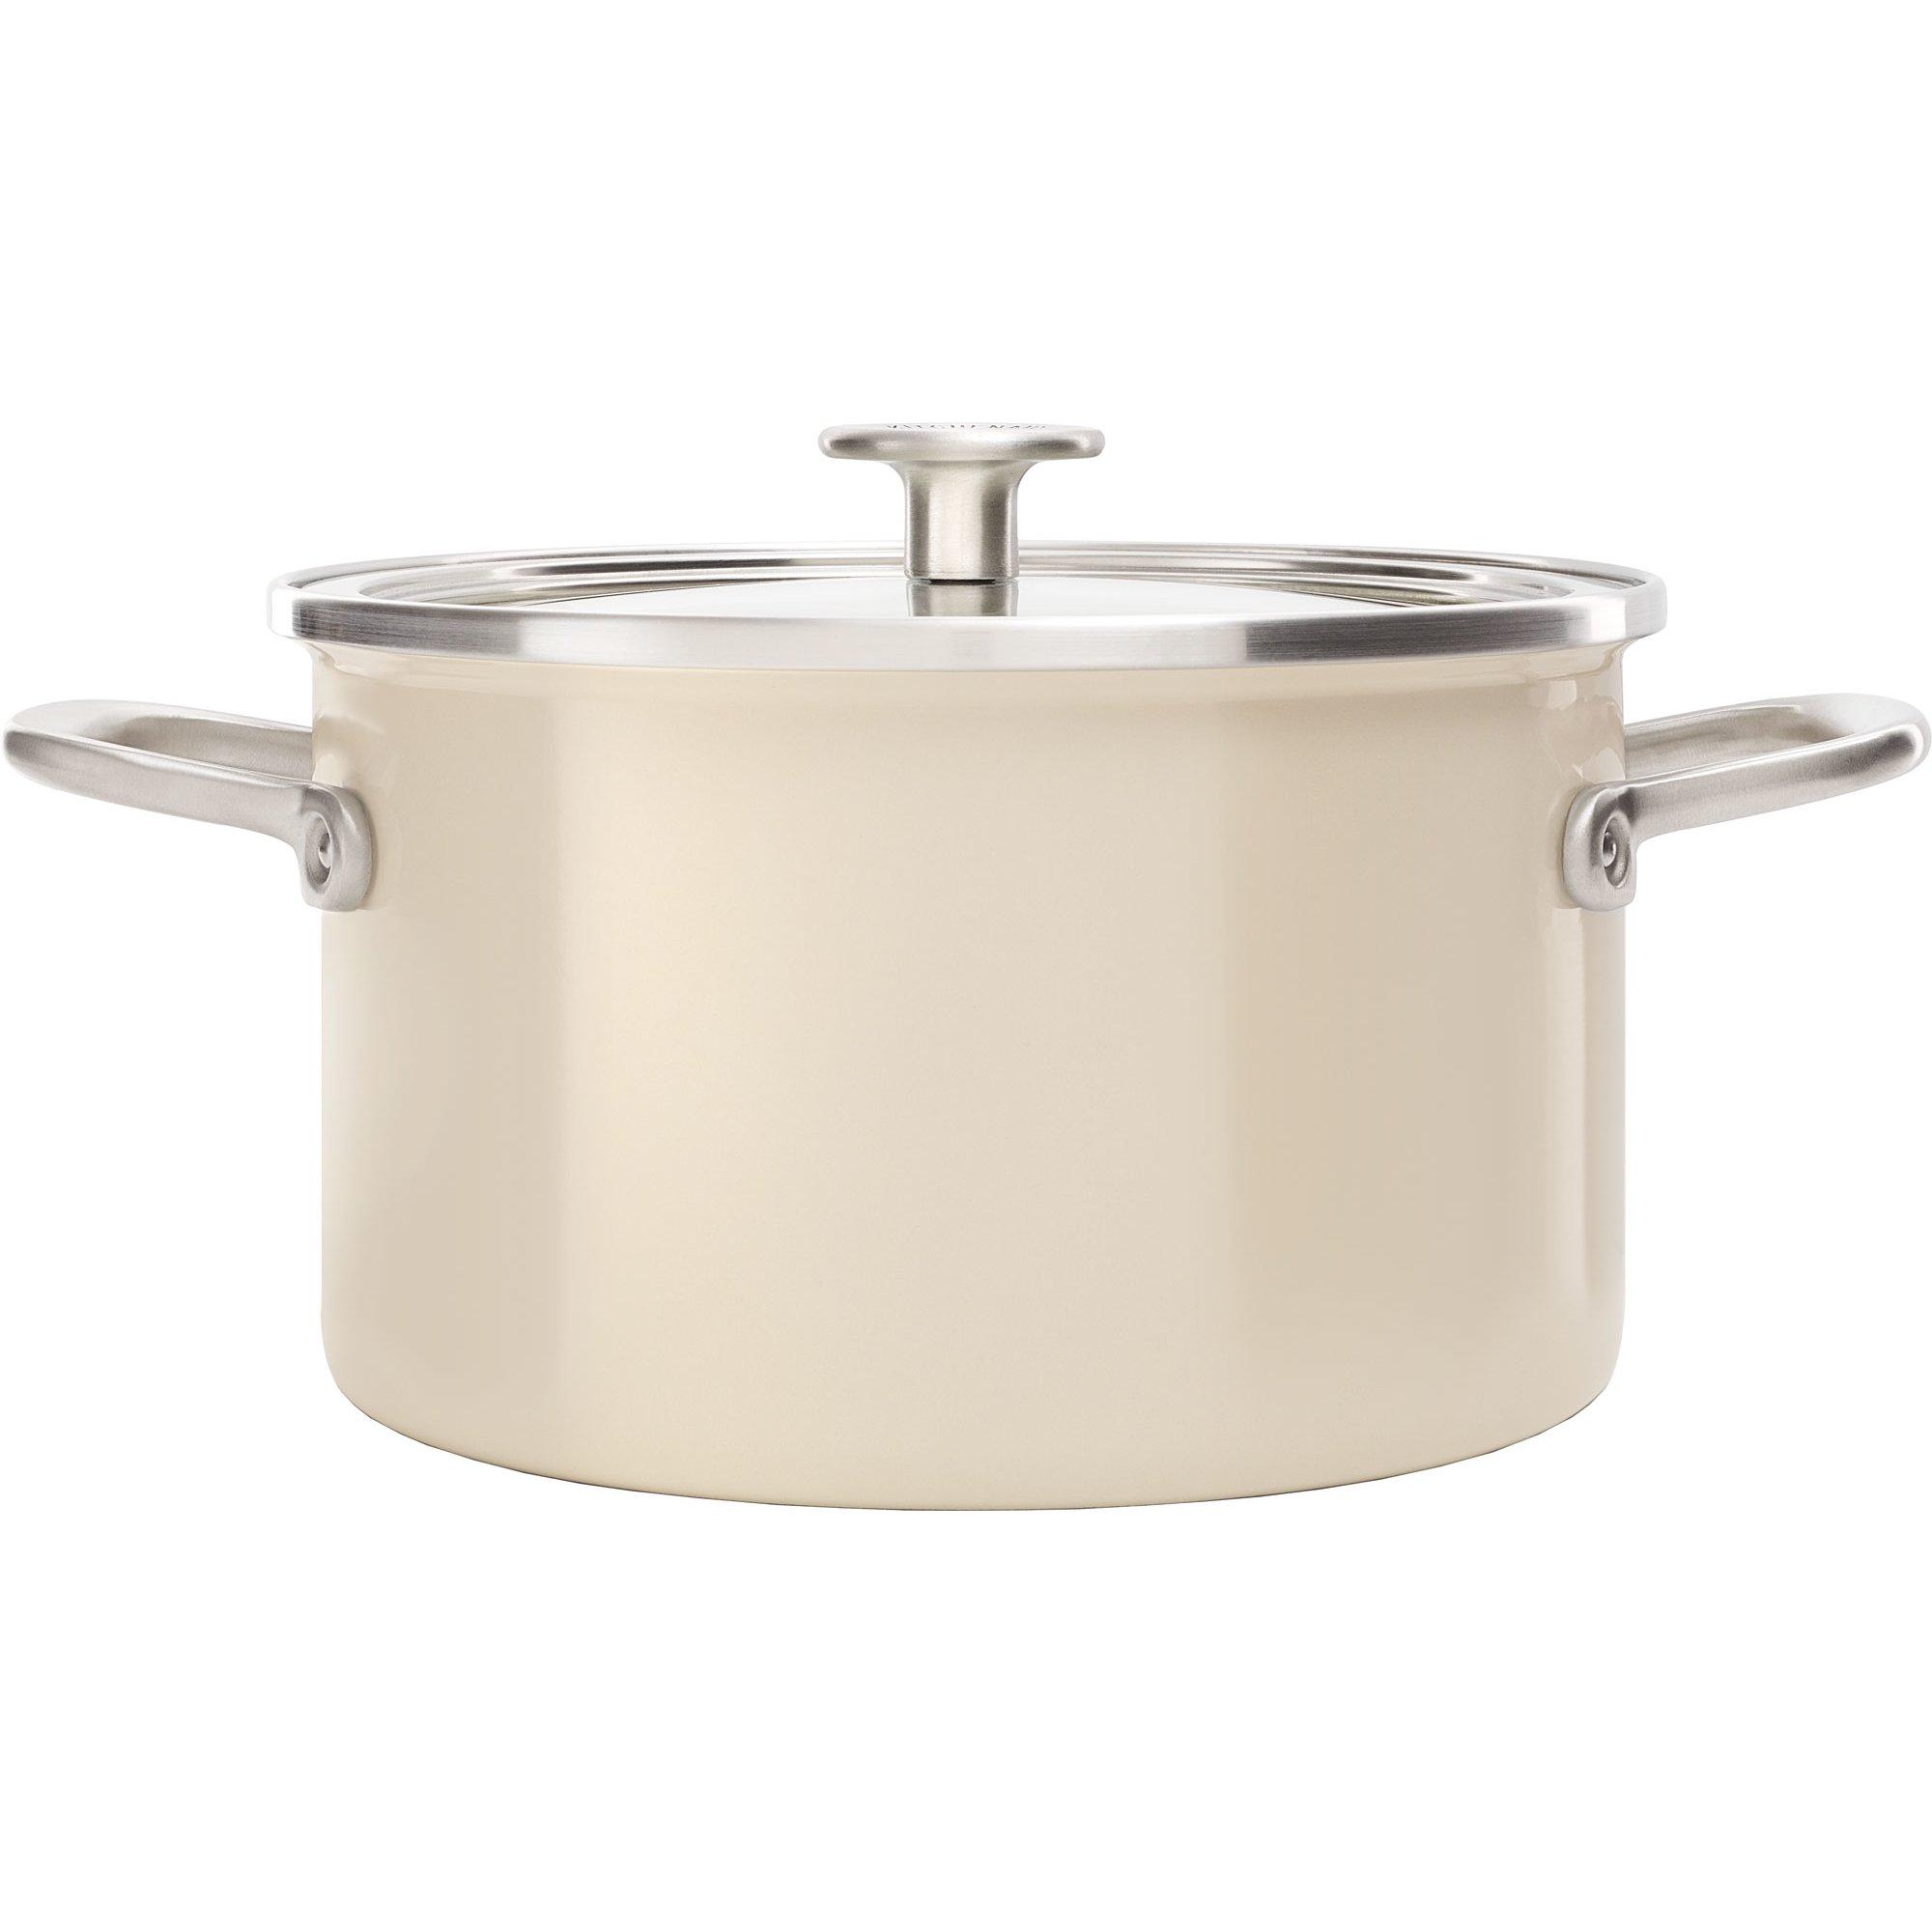 KitchenAid Cookware Collection Gryta m/lock 20 cm mandel